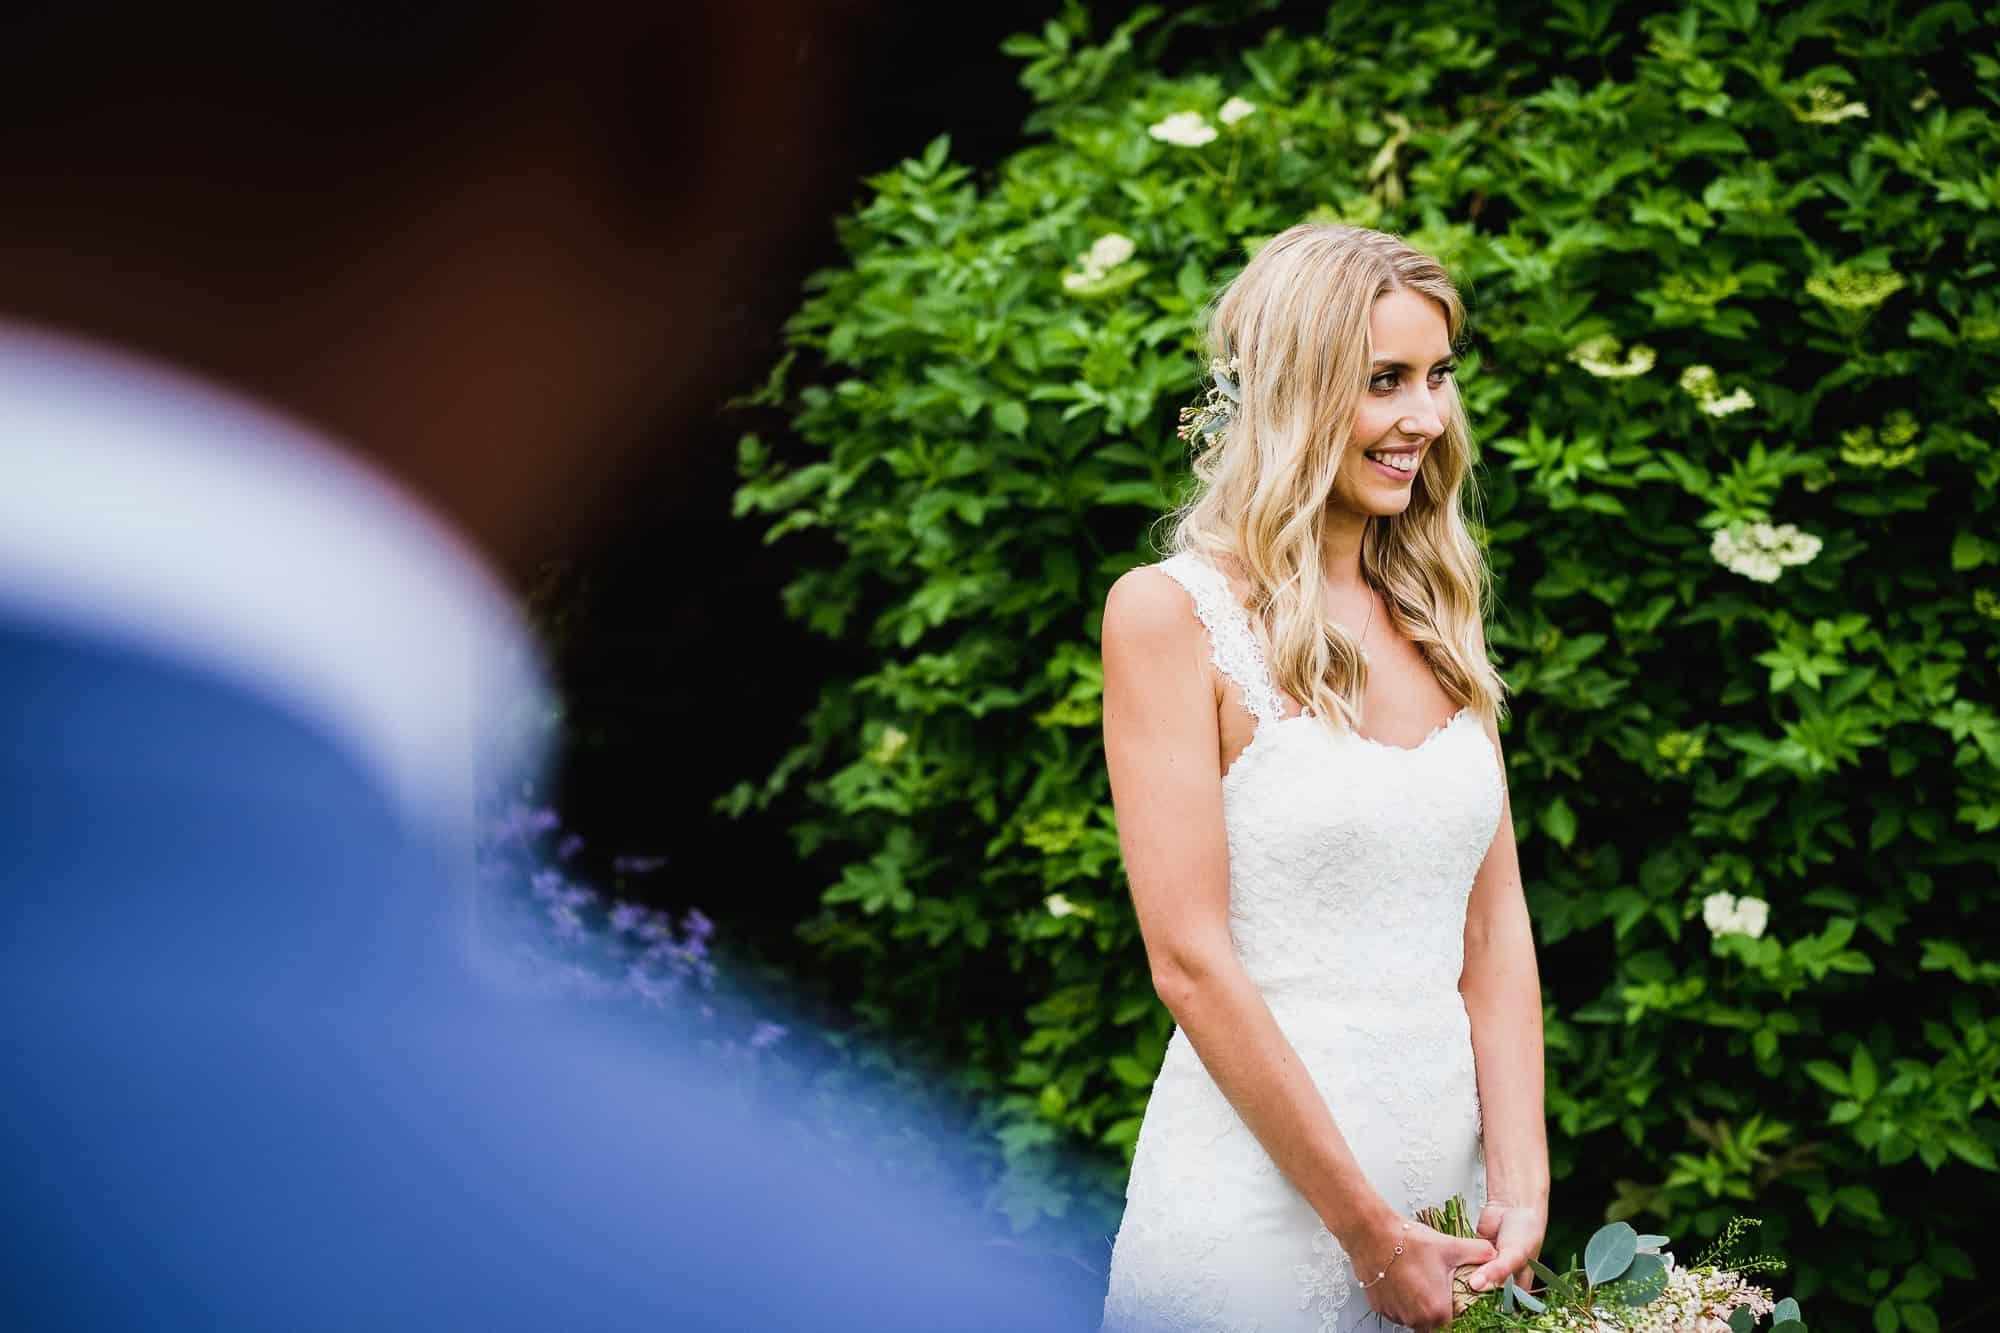 marleybrook-house-wedding-photography-matt-tyler-0044